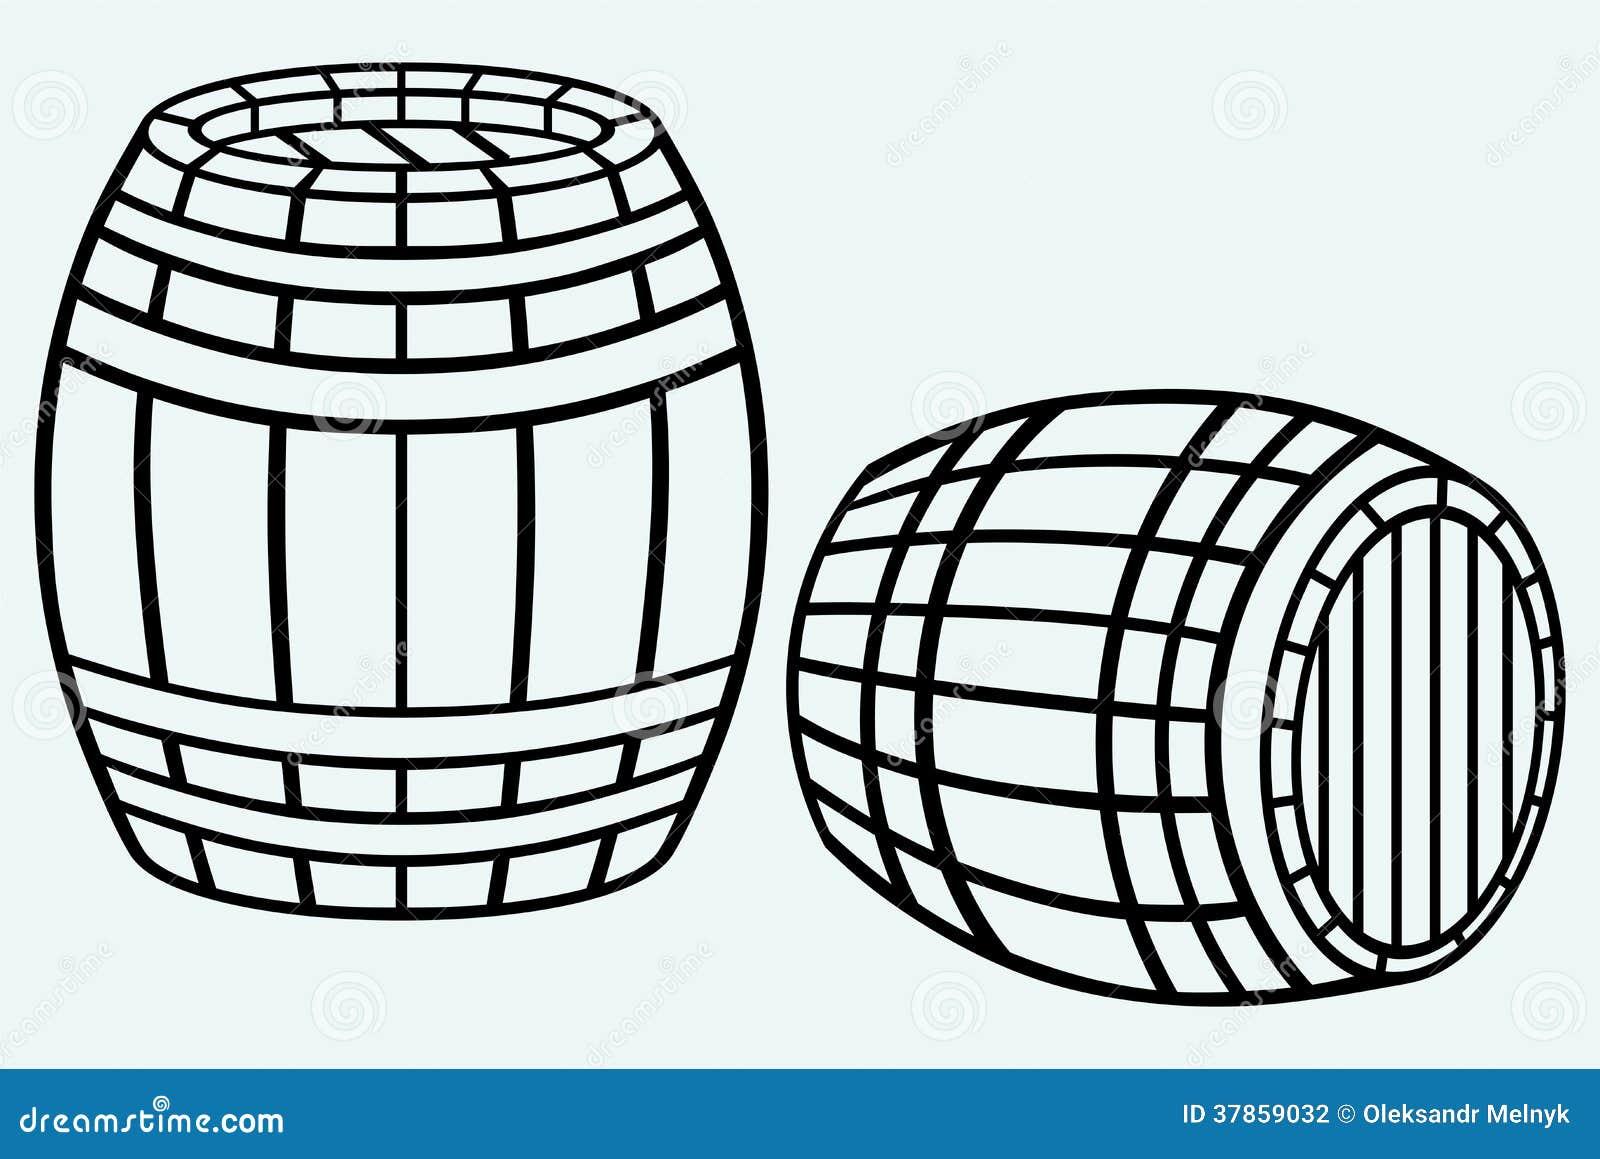 h lzernes fass stockfotografie bild 37859032. Black Bedroom Furniture Sets. Home Design Ideas